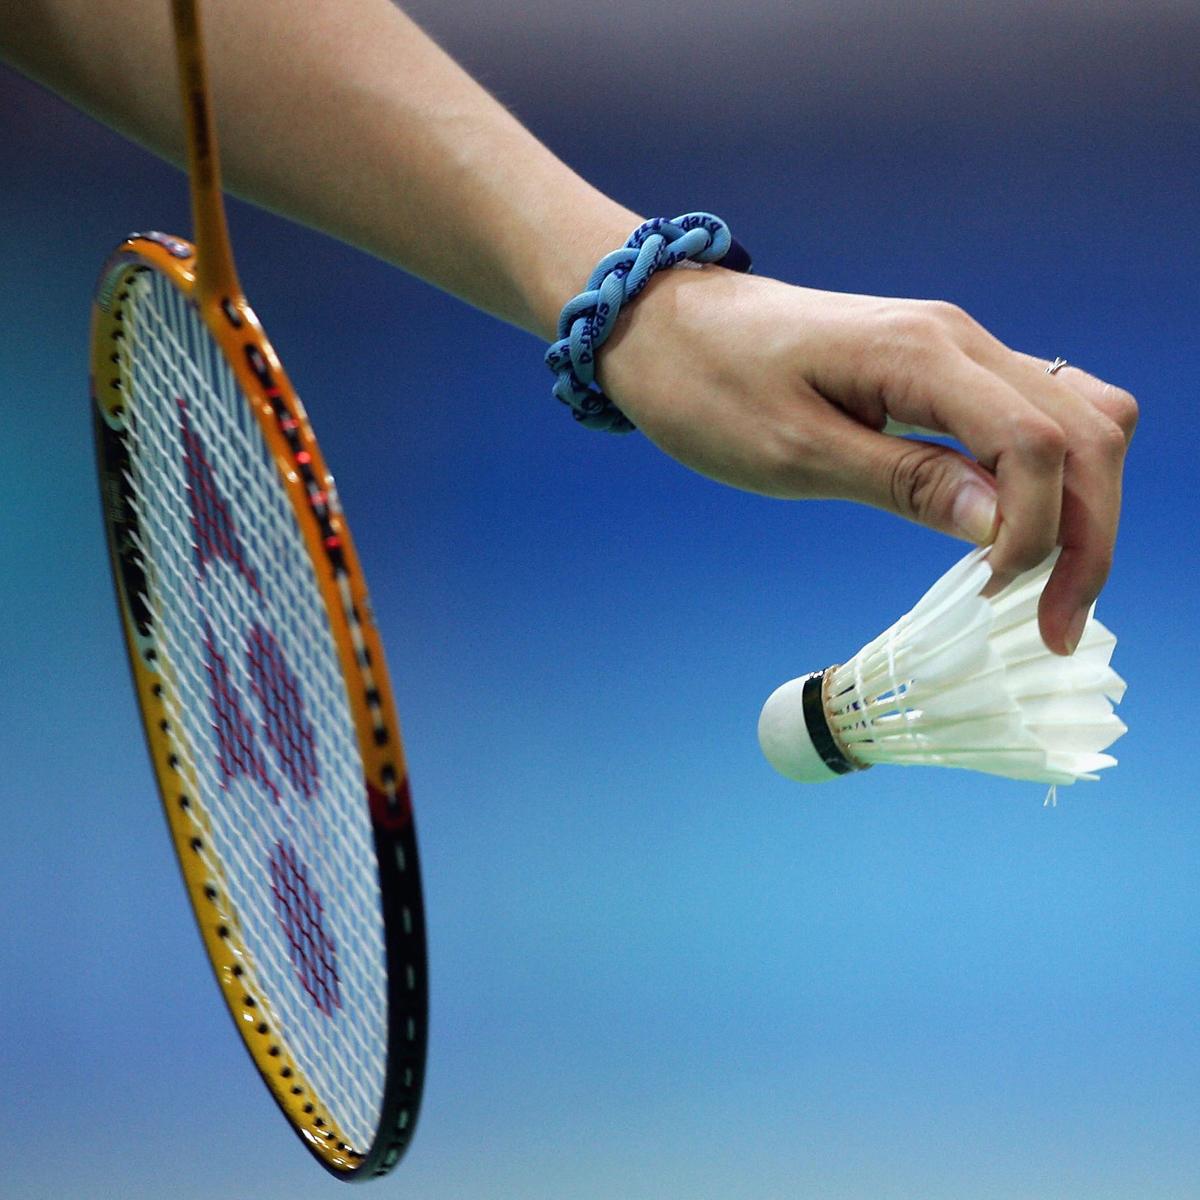 Watch Badminton Zii Jia Lee Chen Long Men S Singles Round Of 16 Live Stream Tokyo 2020 Olympics